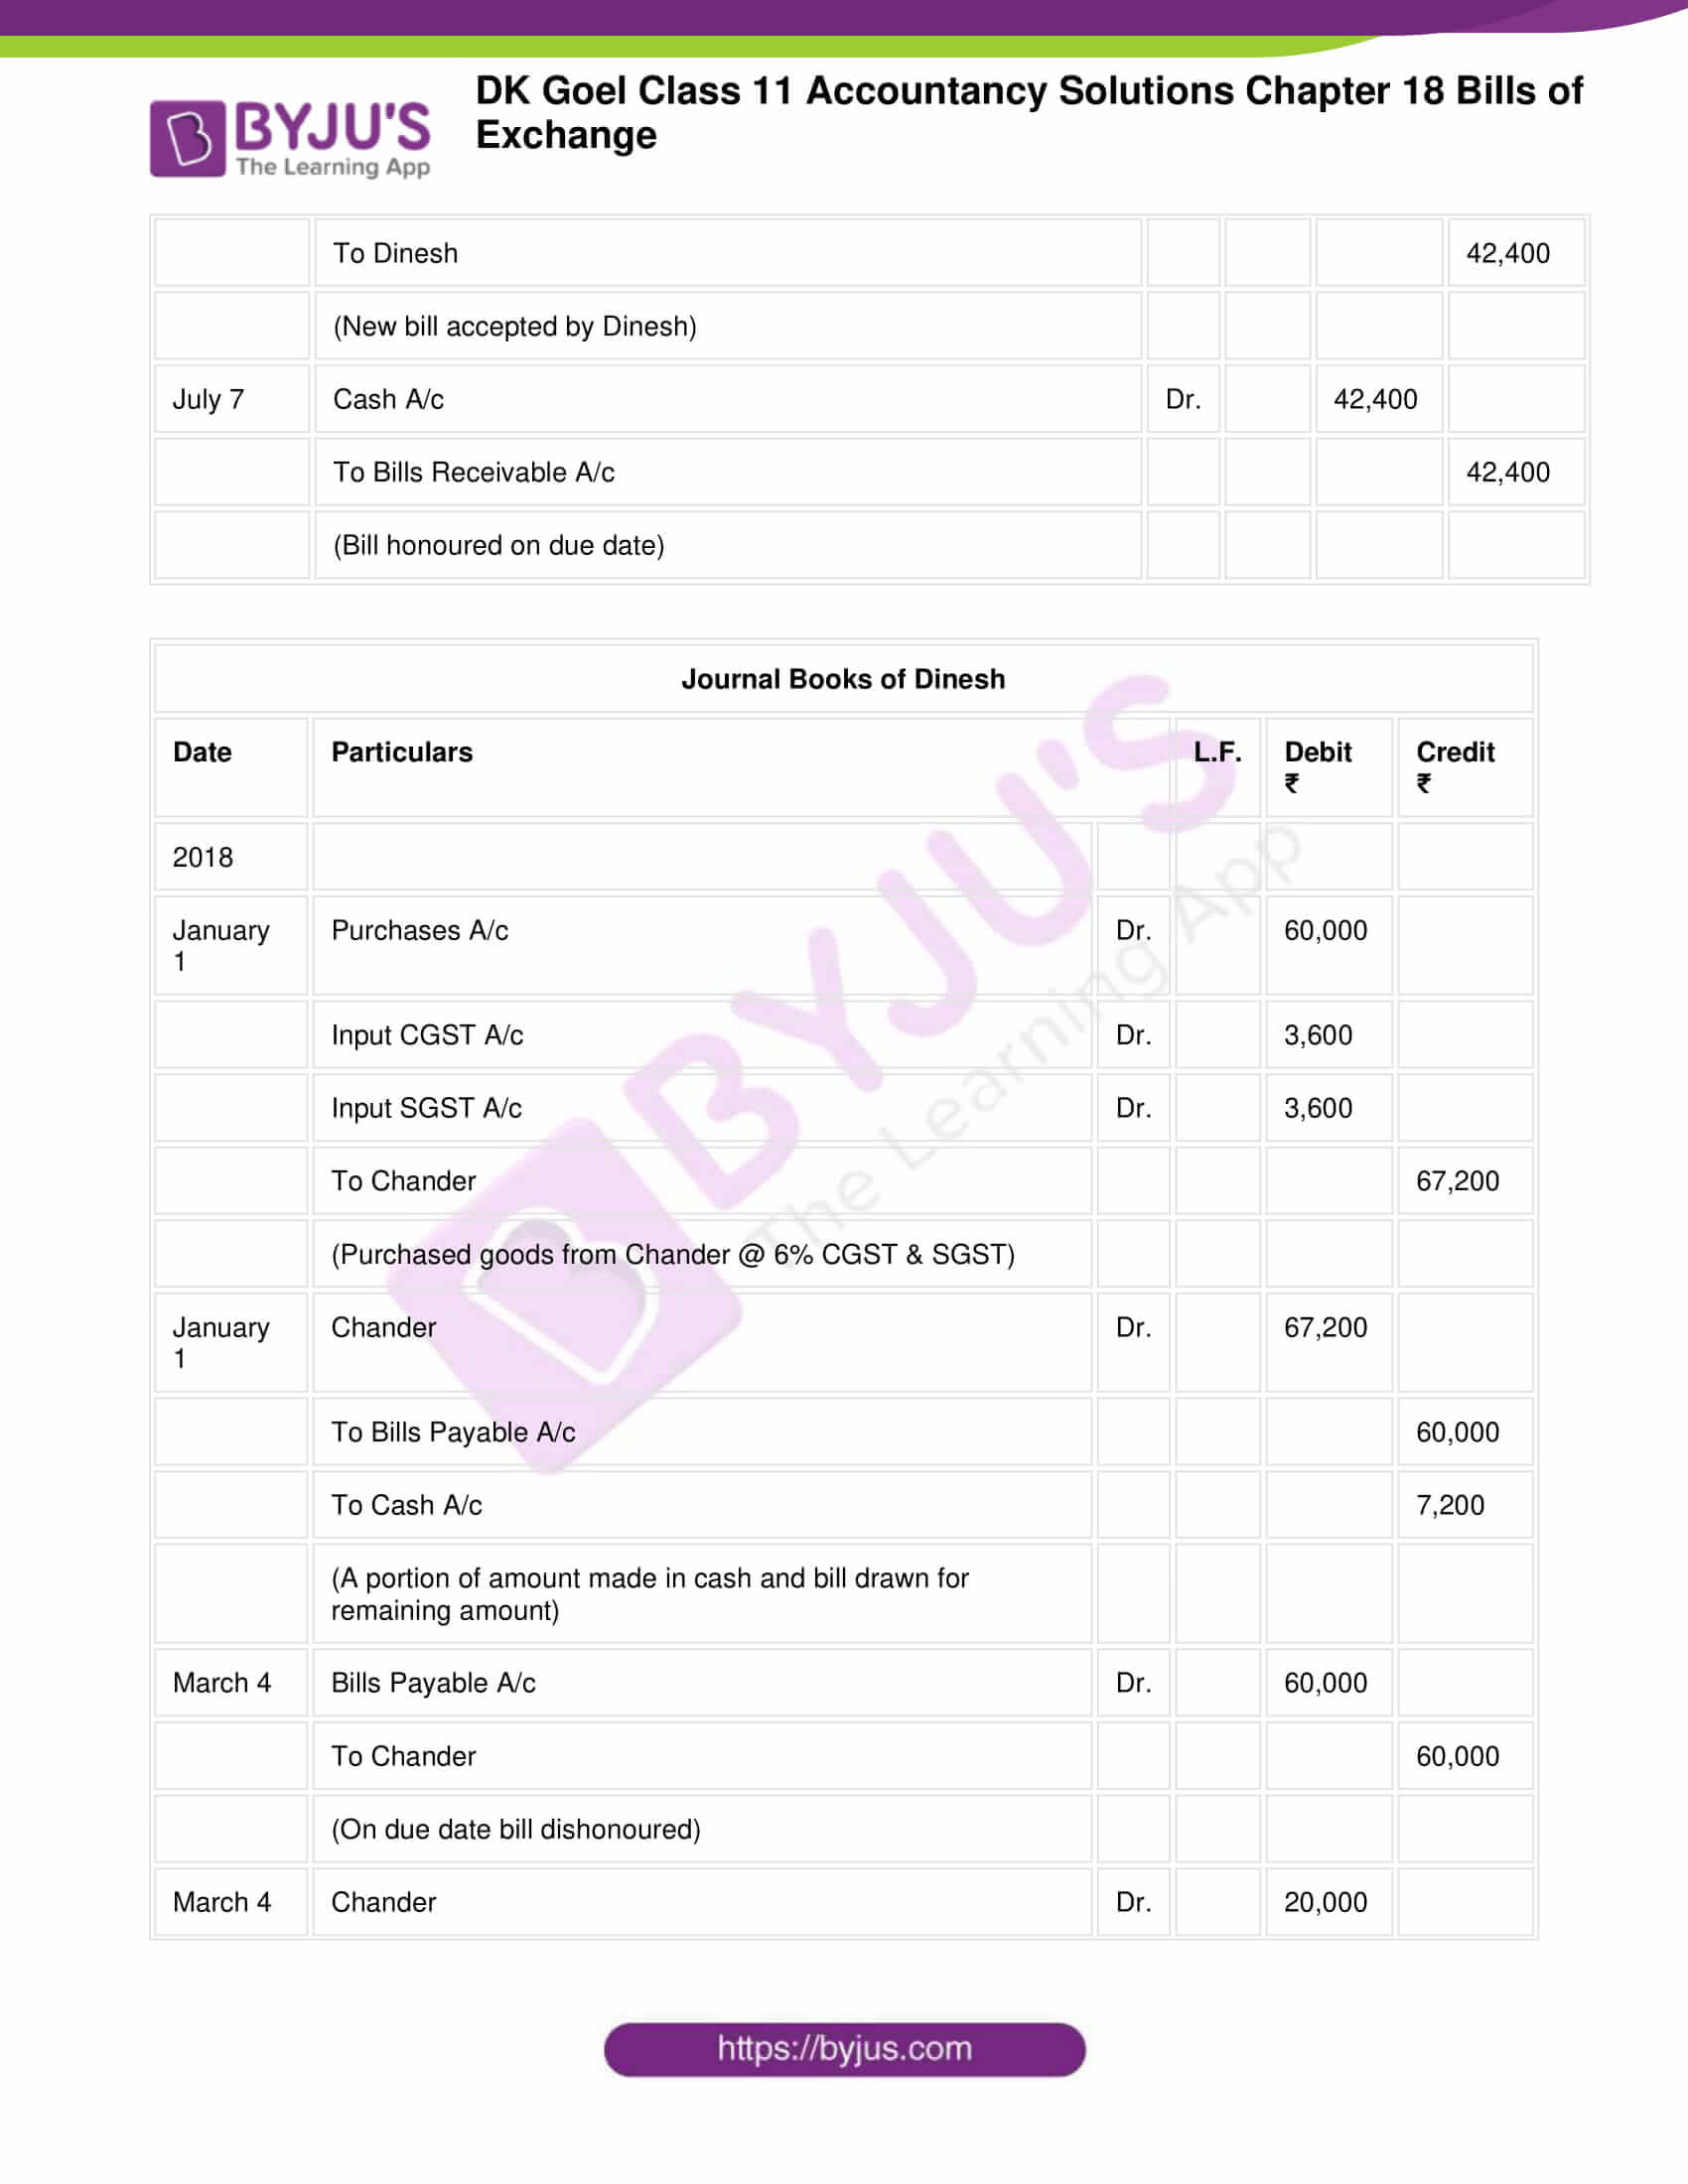 dk goel class 11 accountancy solutions chapter 18 035